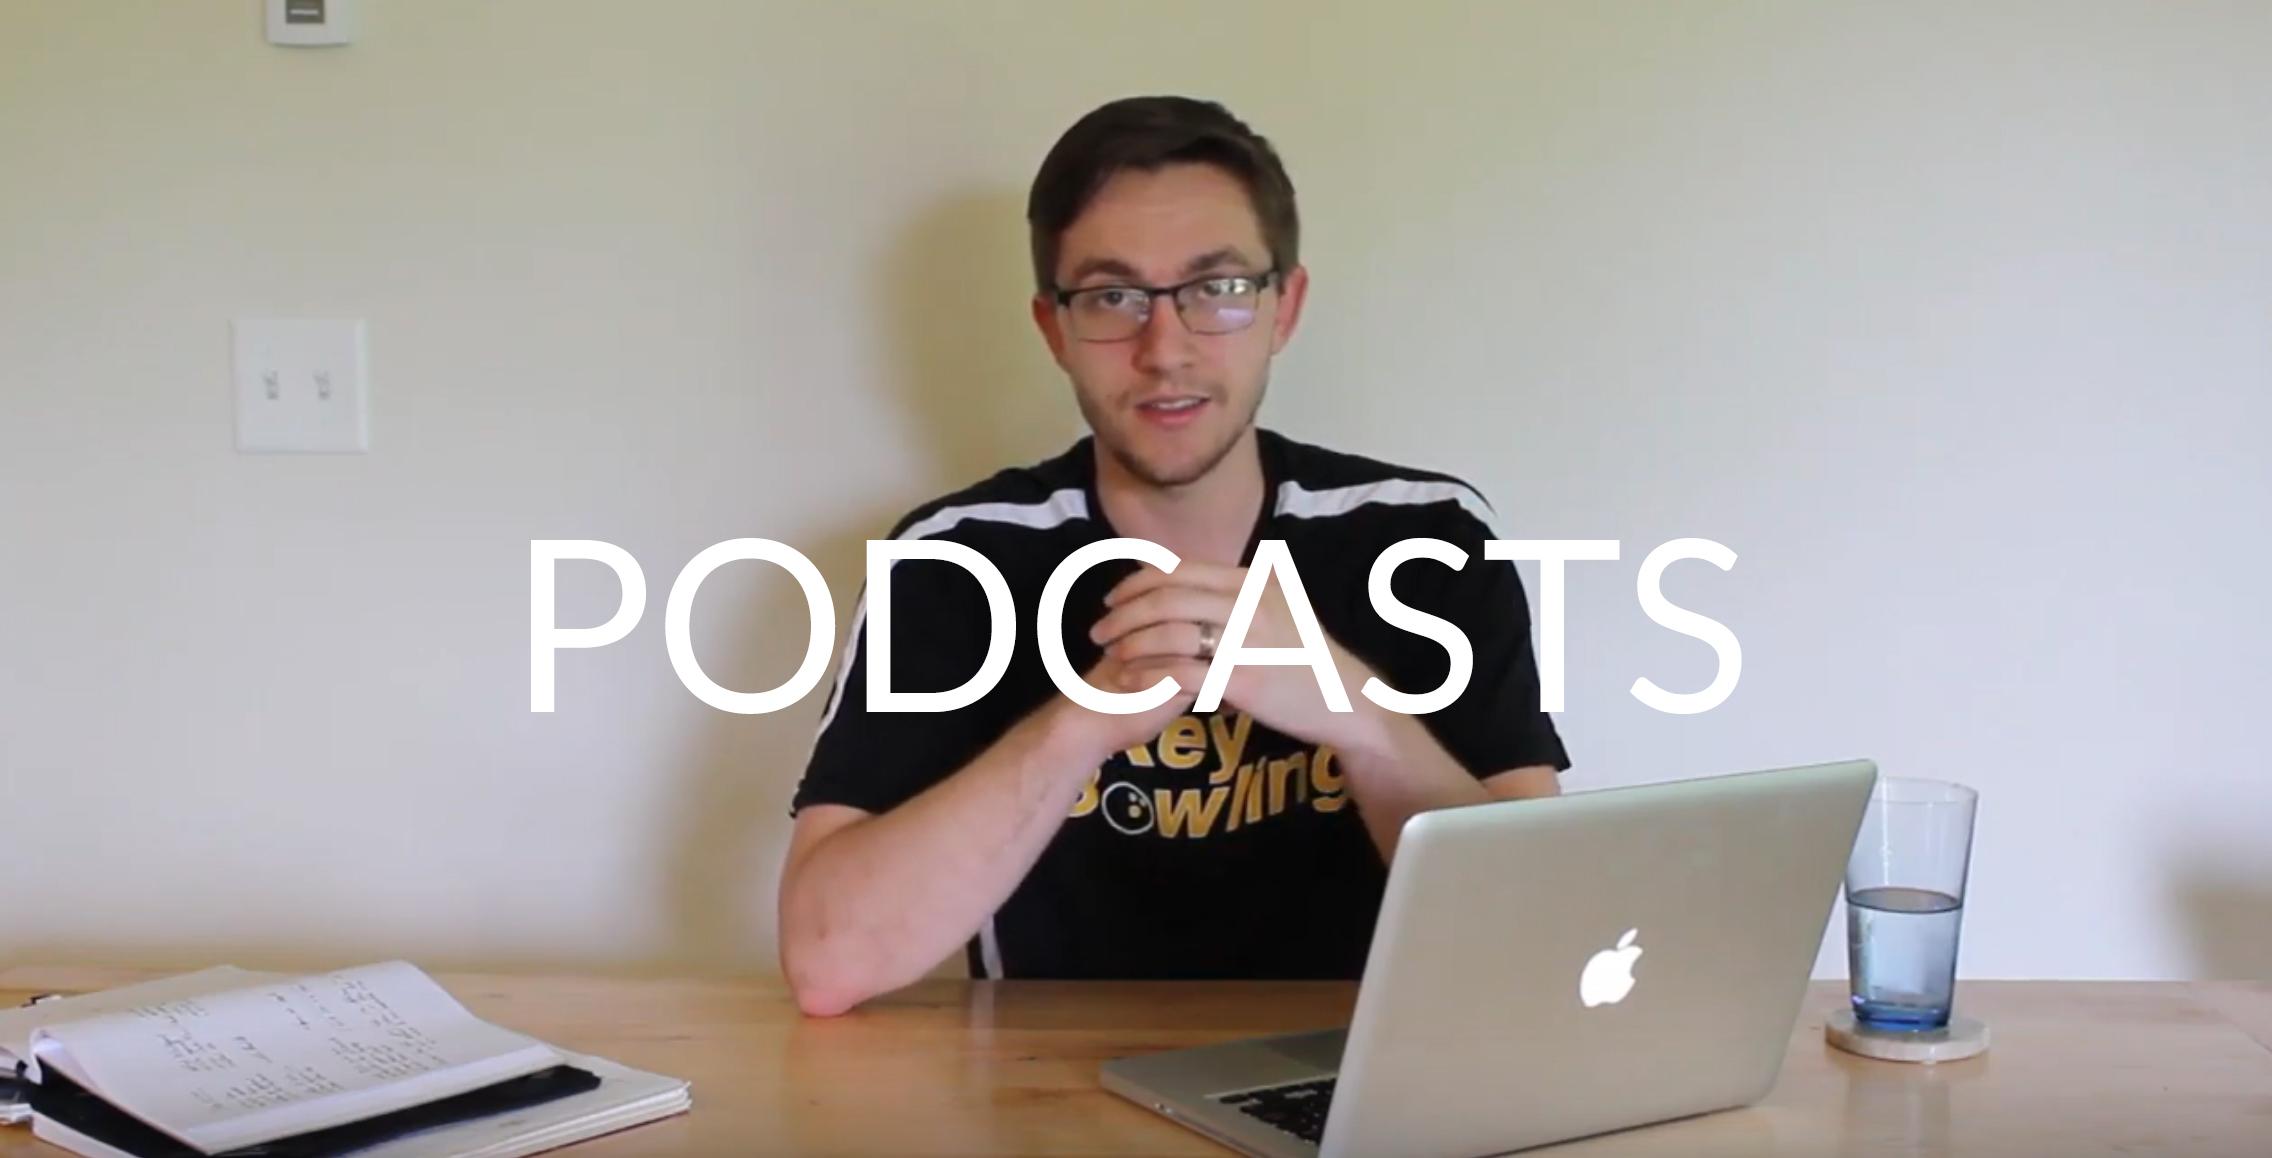 michael-podcast - Copy